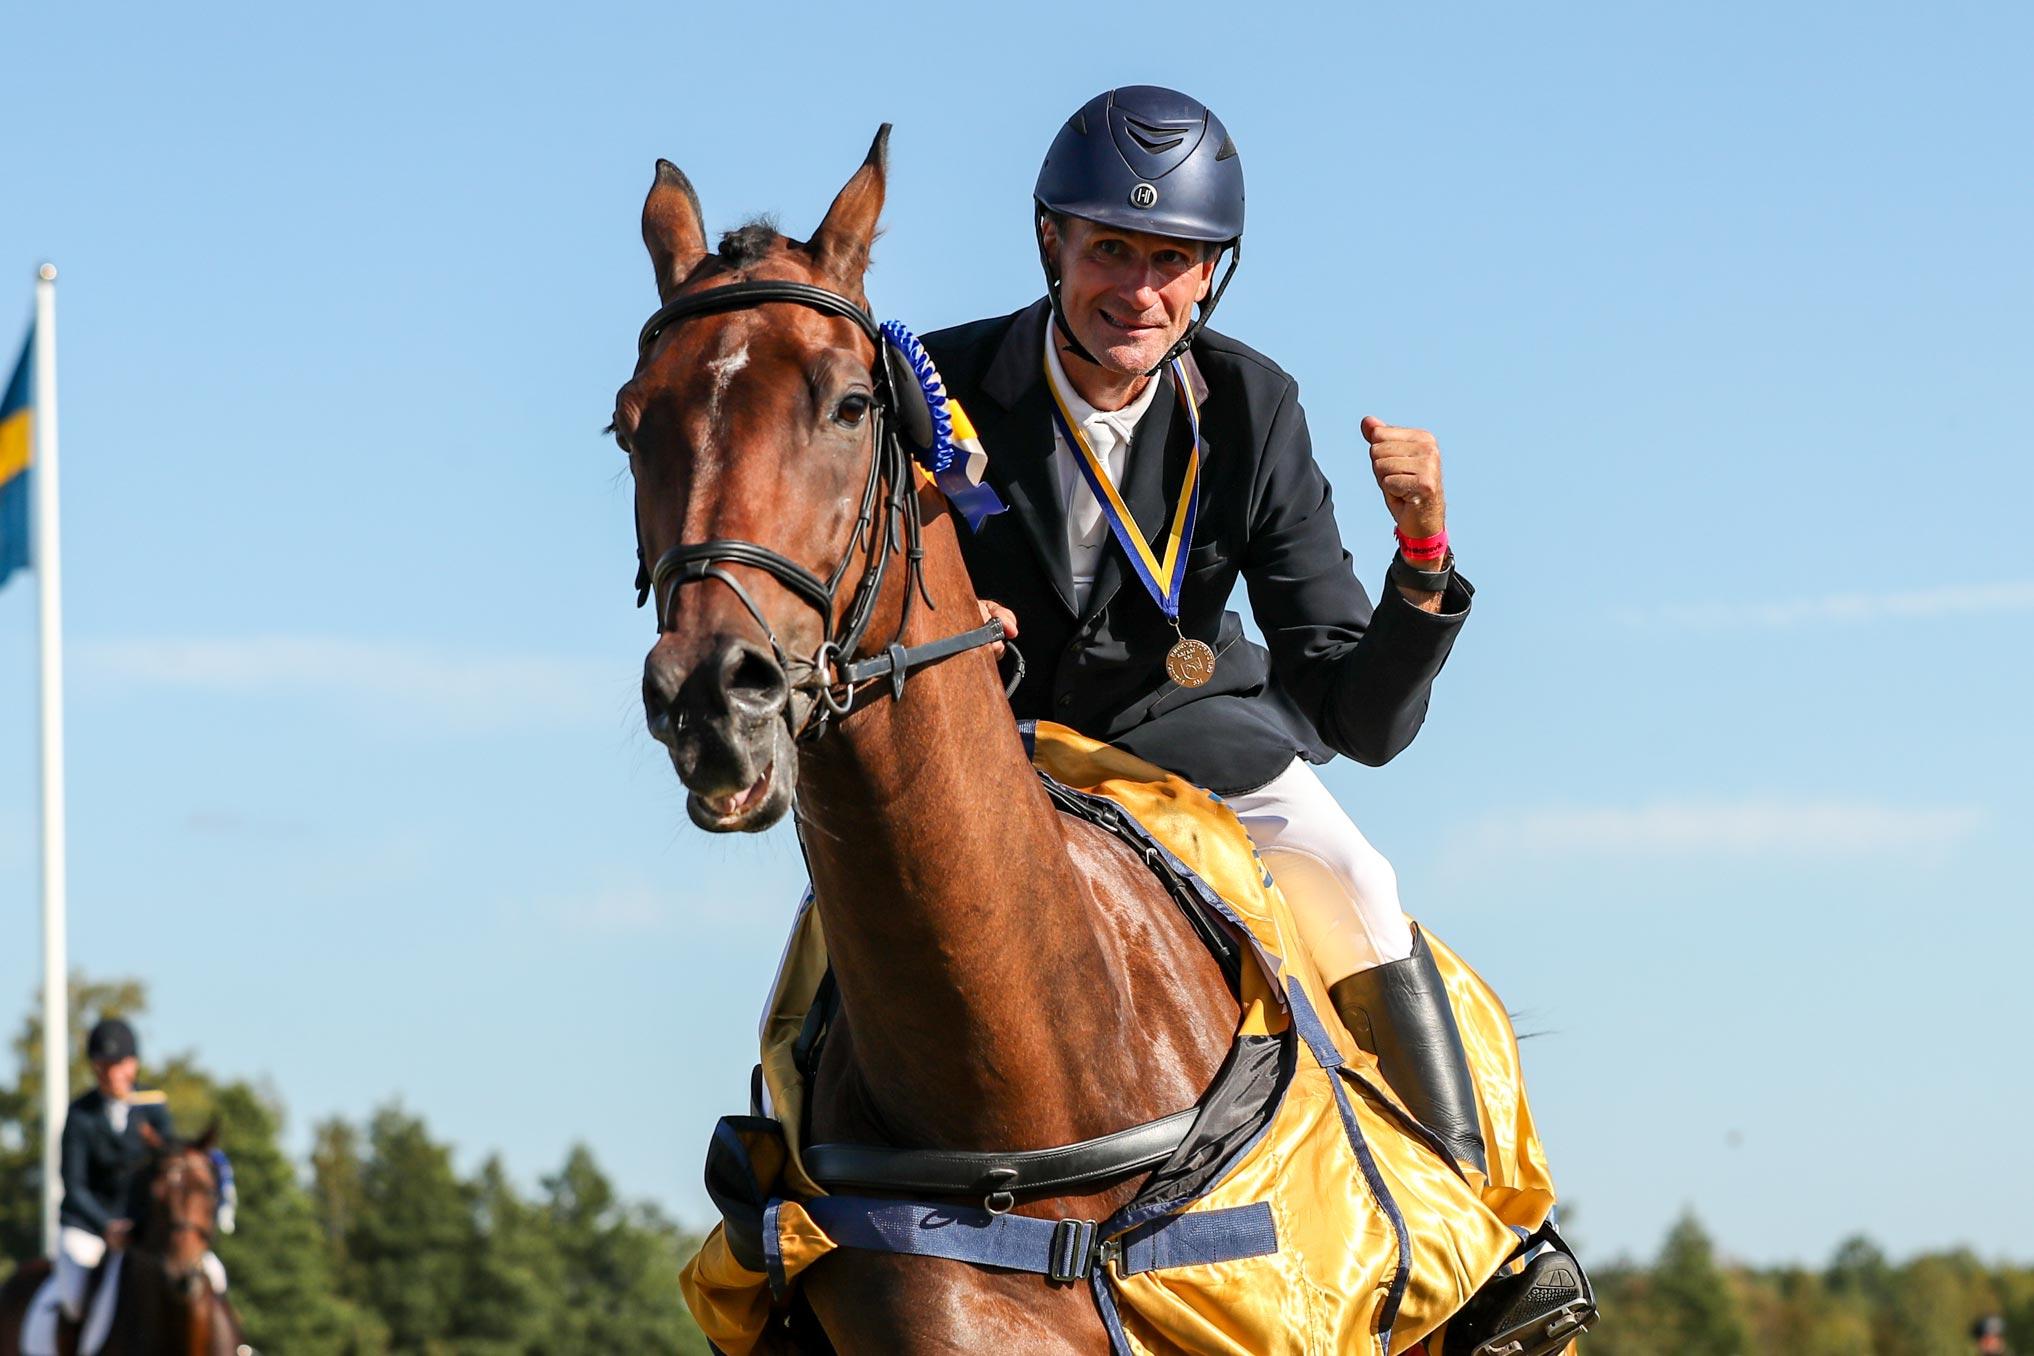 Henrik-adnervik-empero-0923